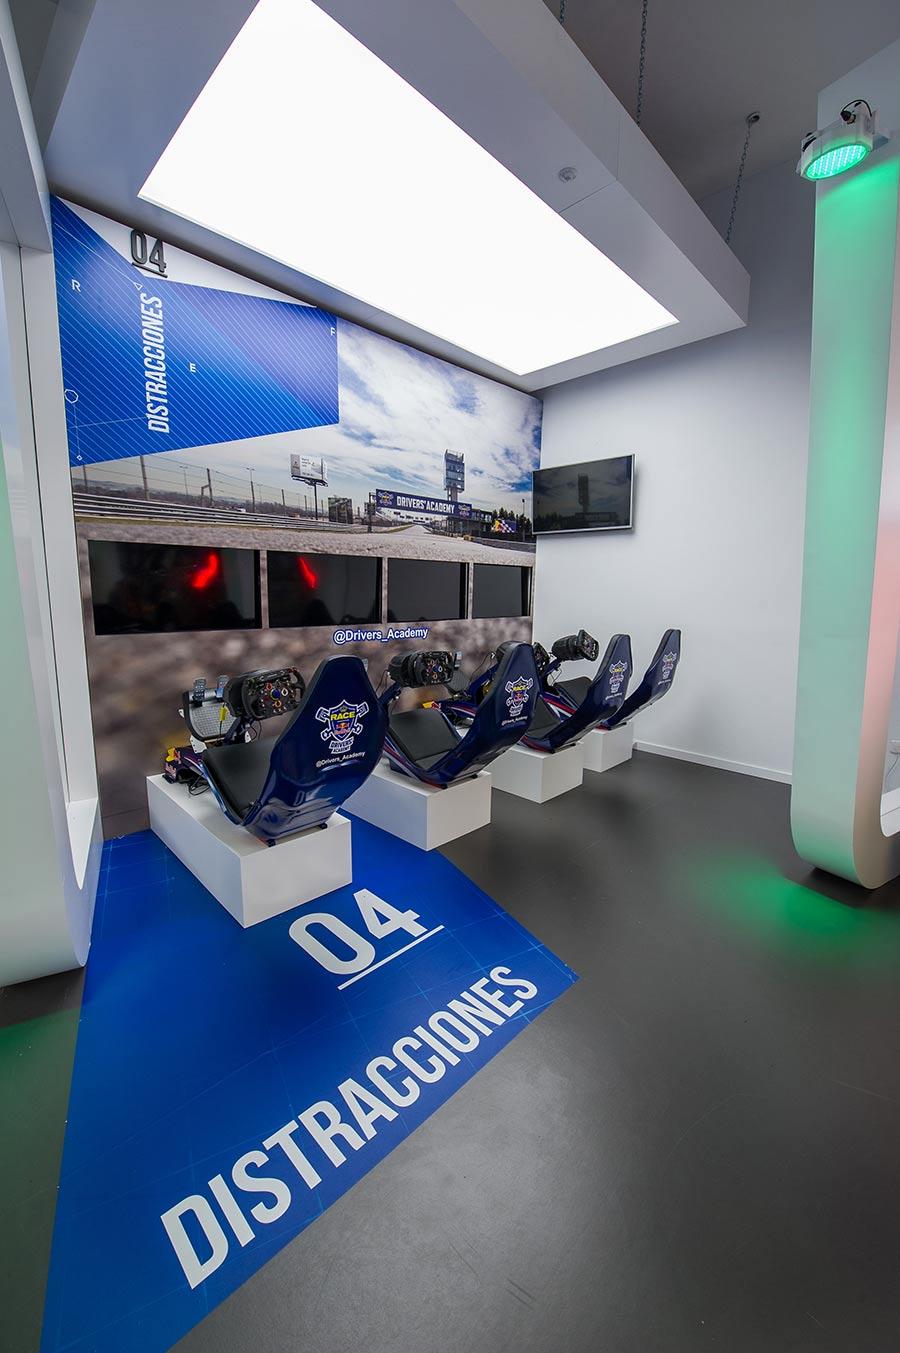 Simuladores Escuela de conducción Drivers' Academy RACE-Red Bull